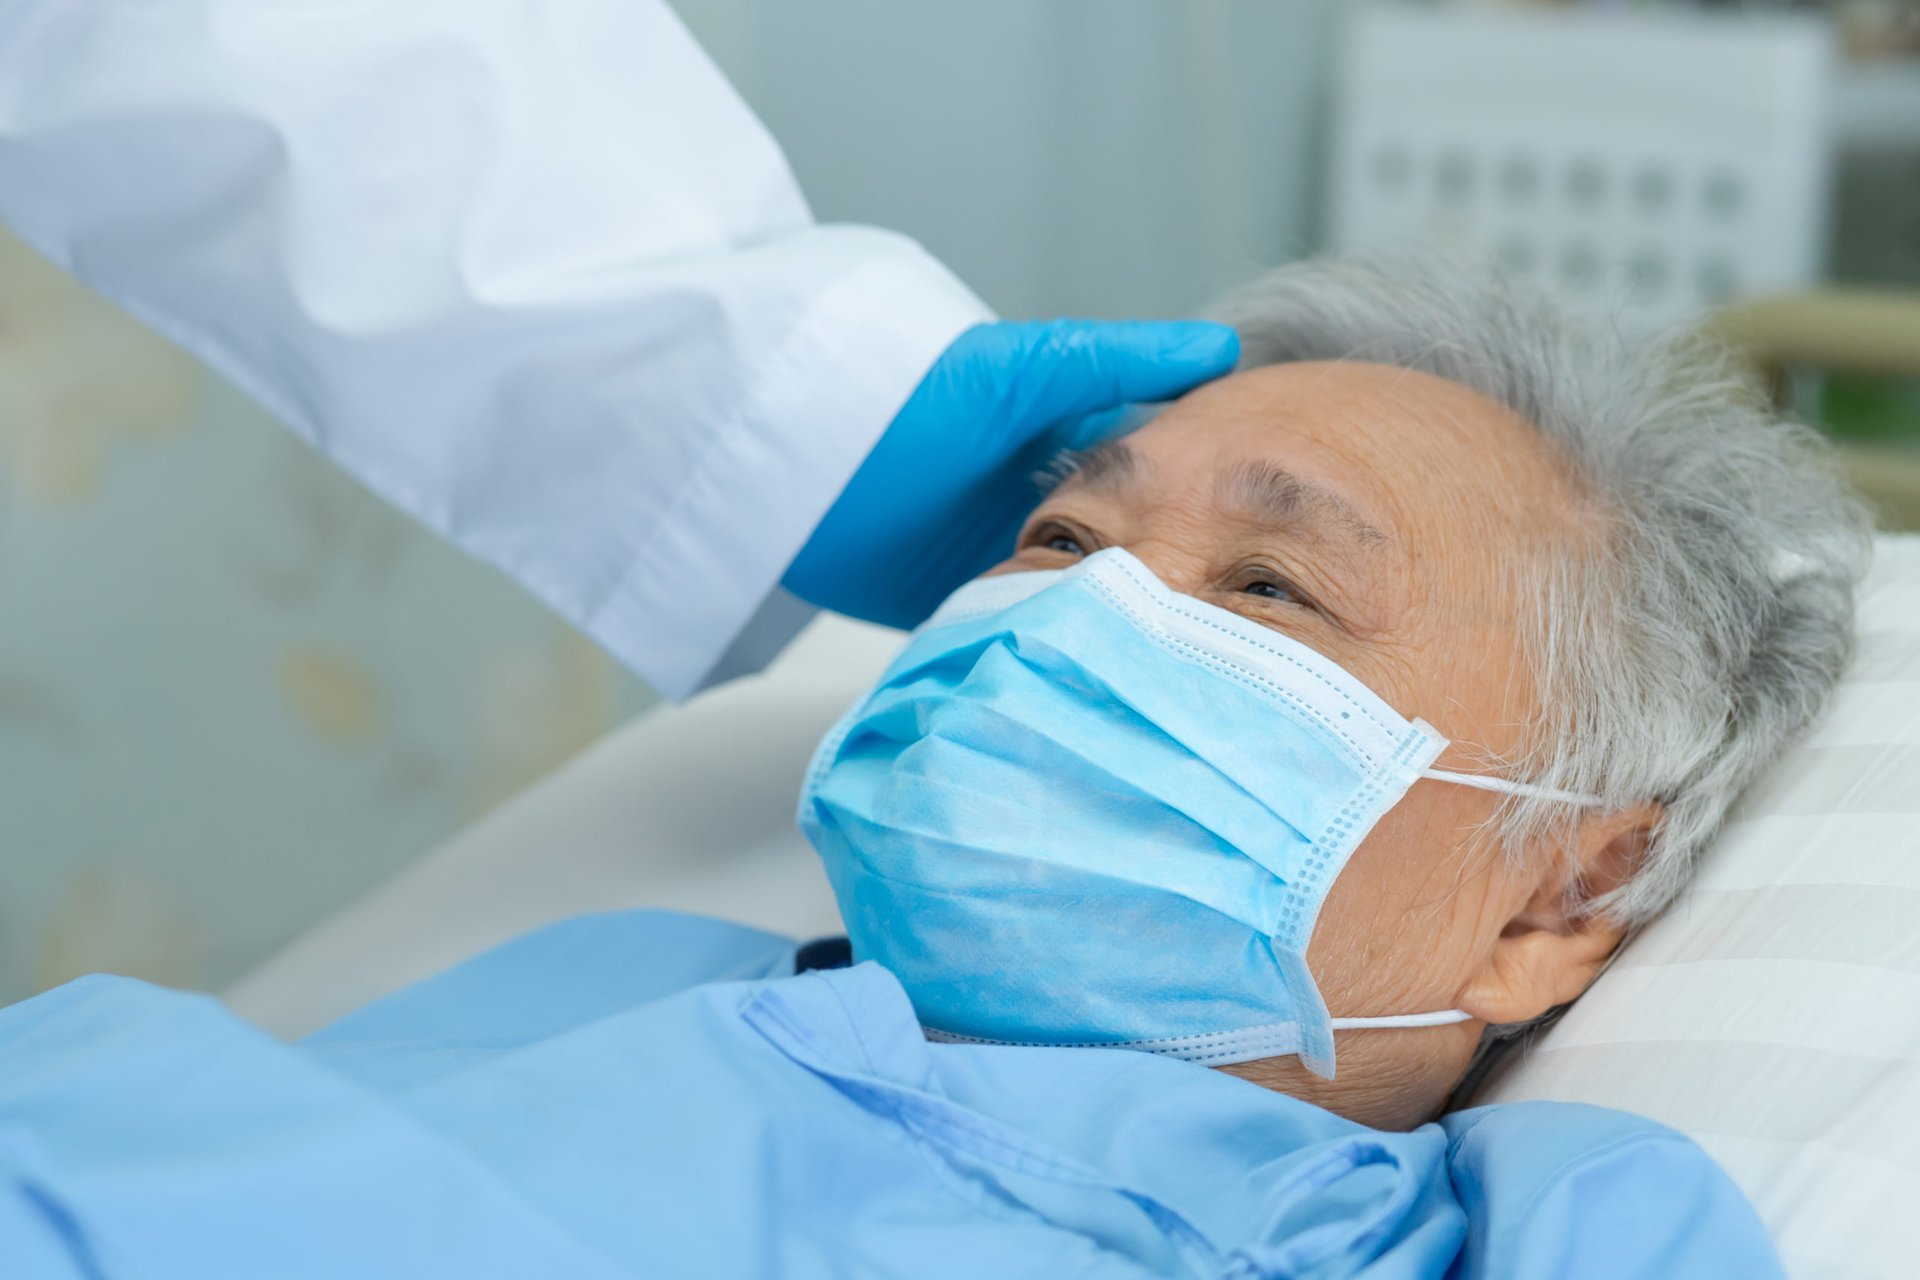 Senior hospitalized with COVID-19